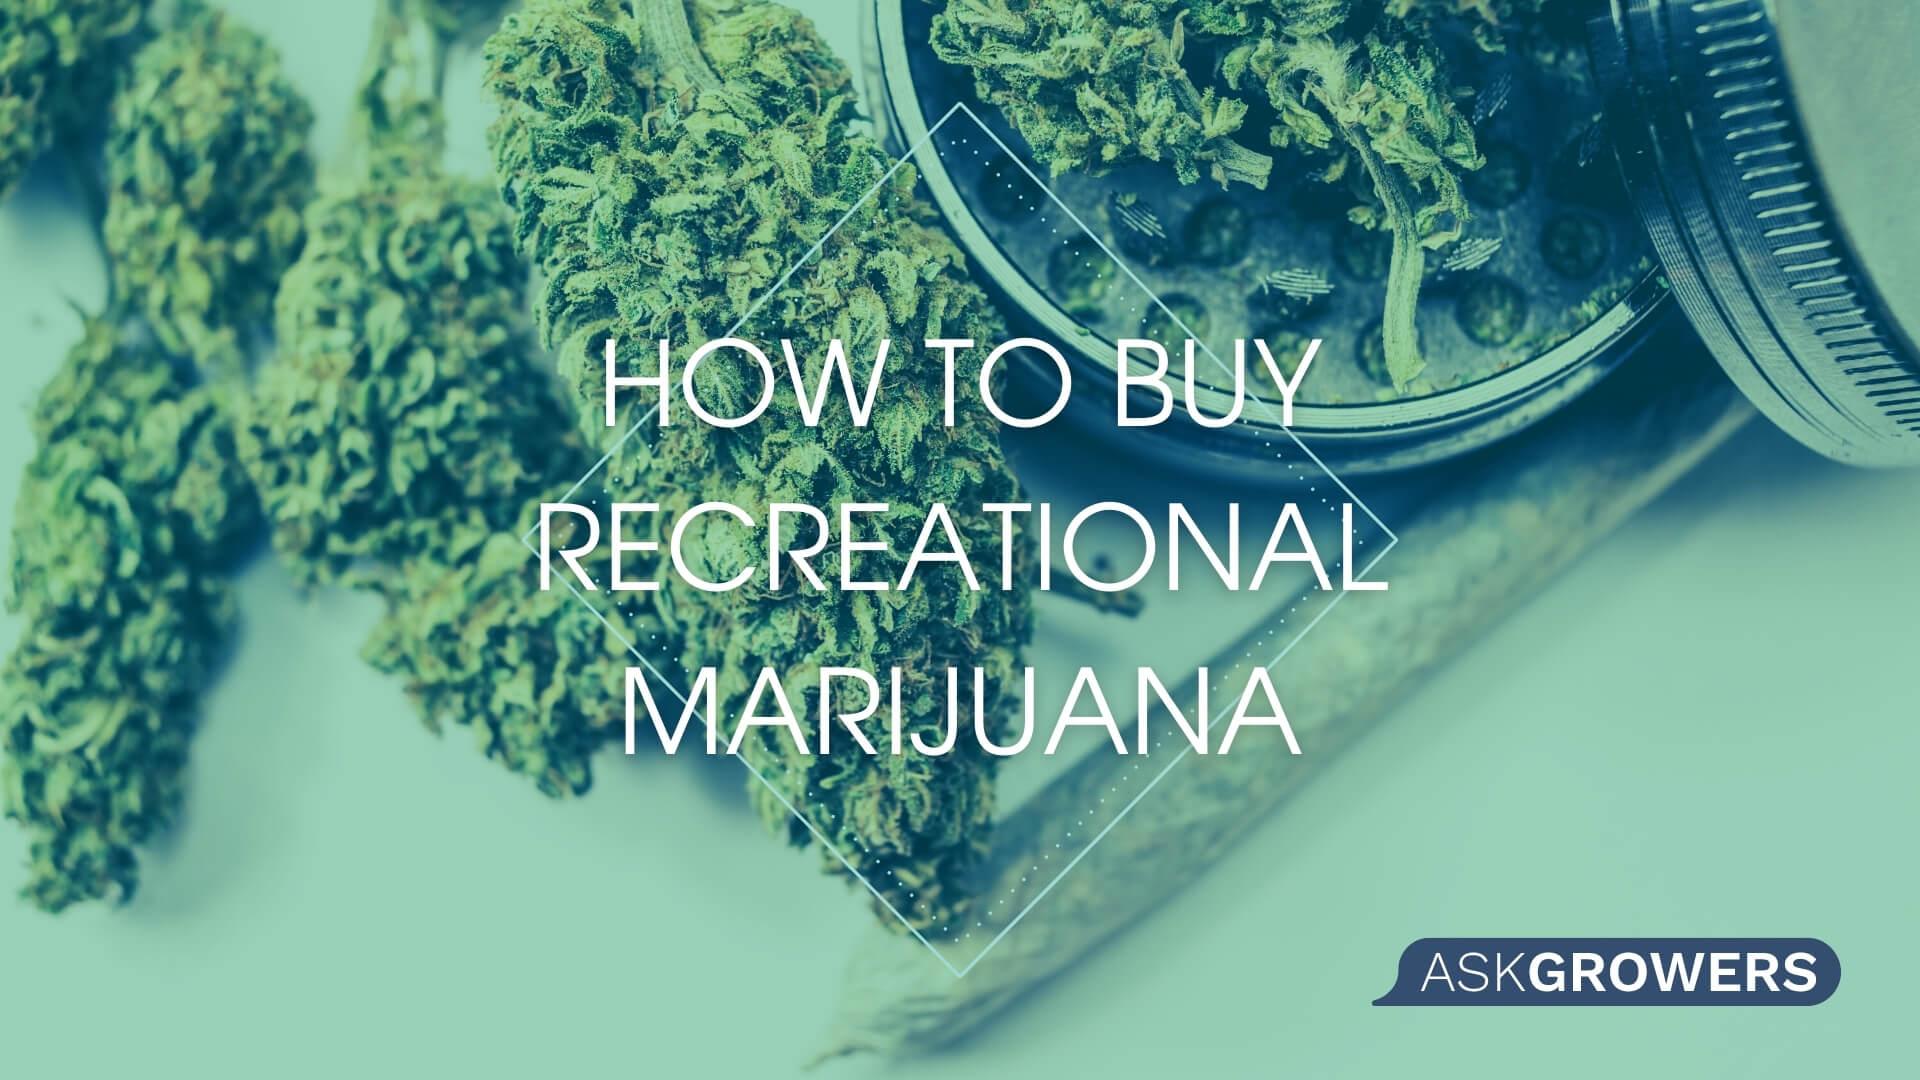 How to Buy Recreational Marijuana, AskGrowers